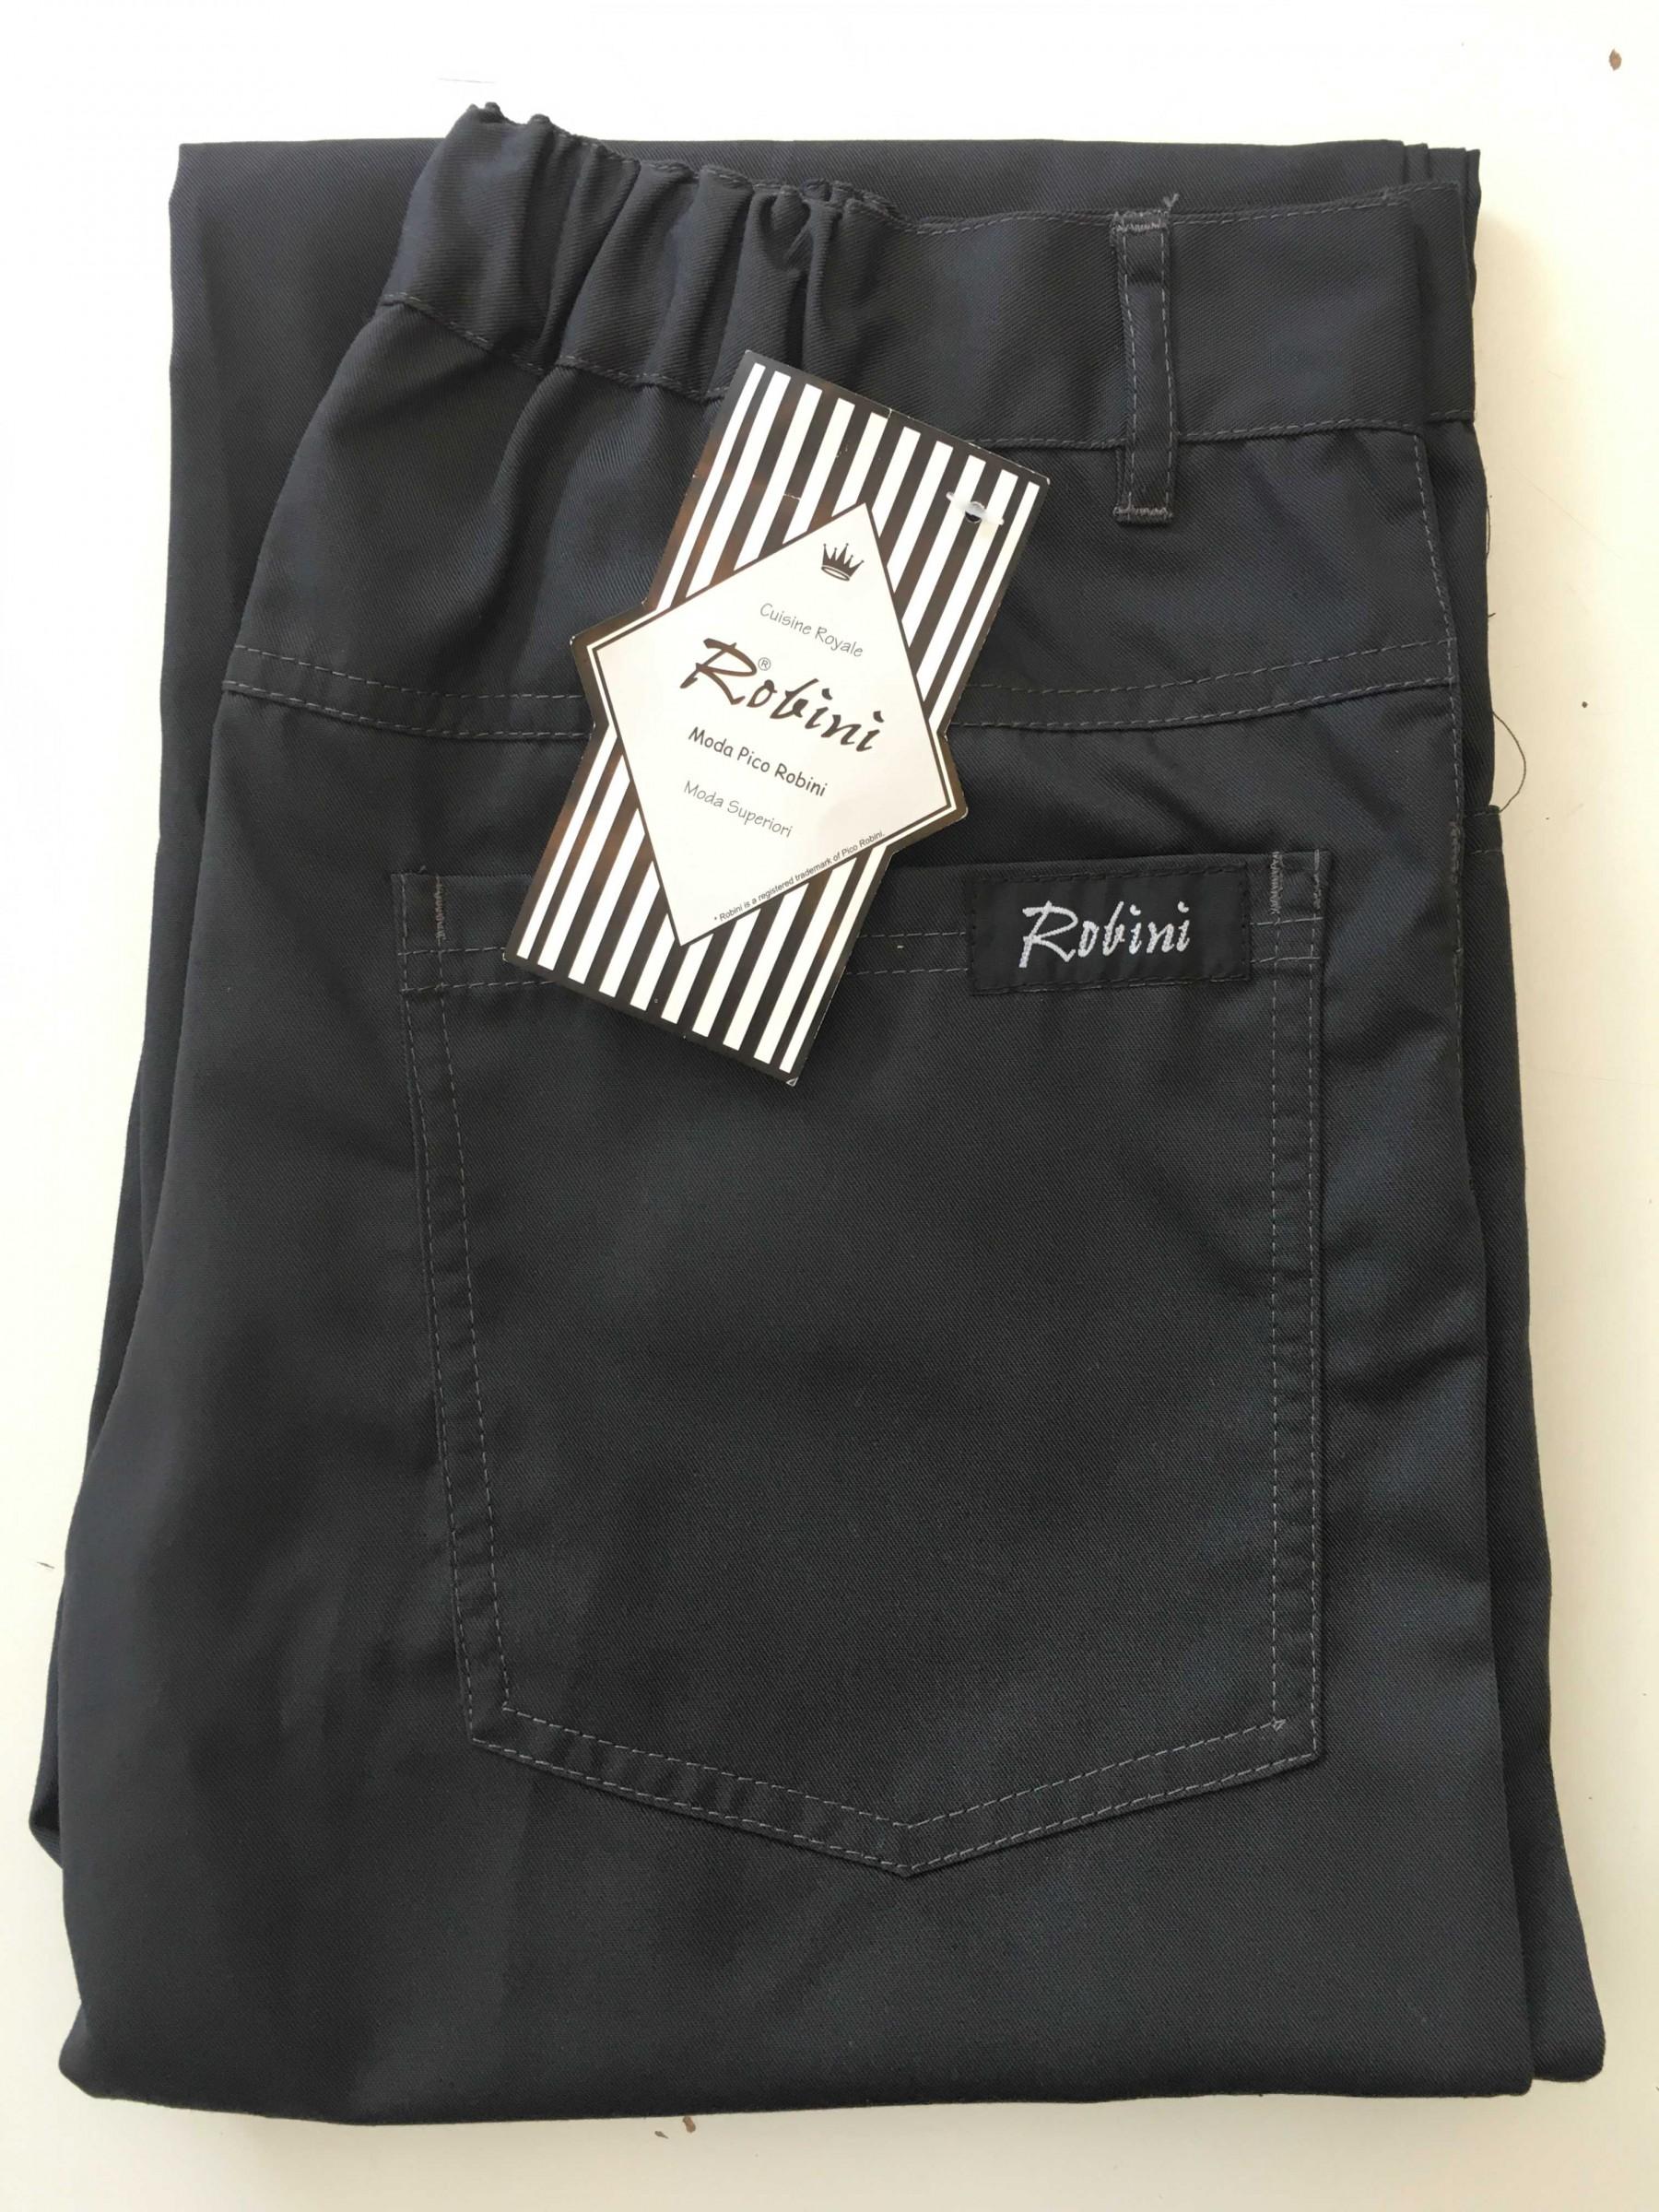 Pantalon 5-Pocket Herren Anthrazit Anthrazit